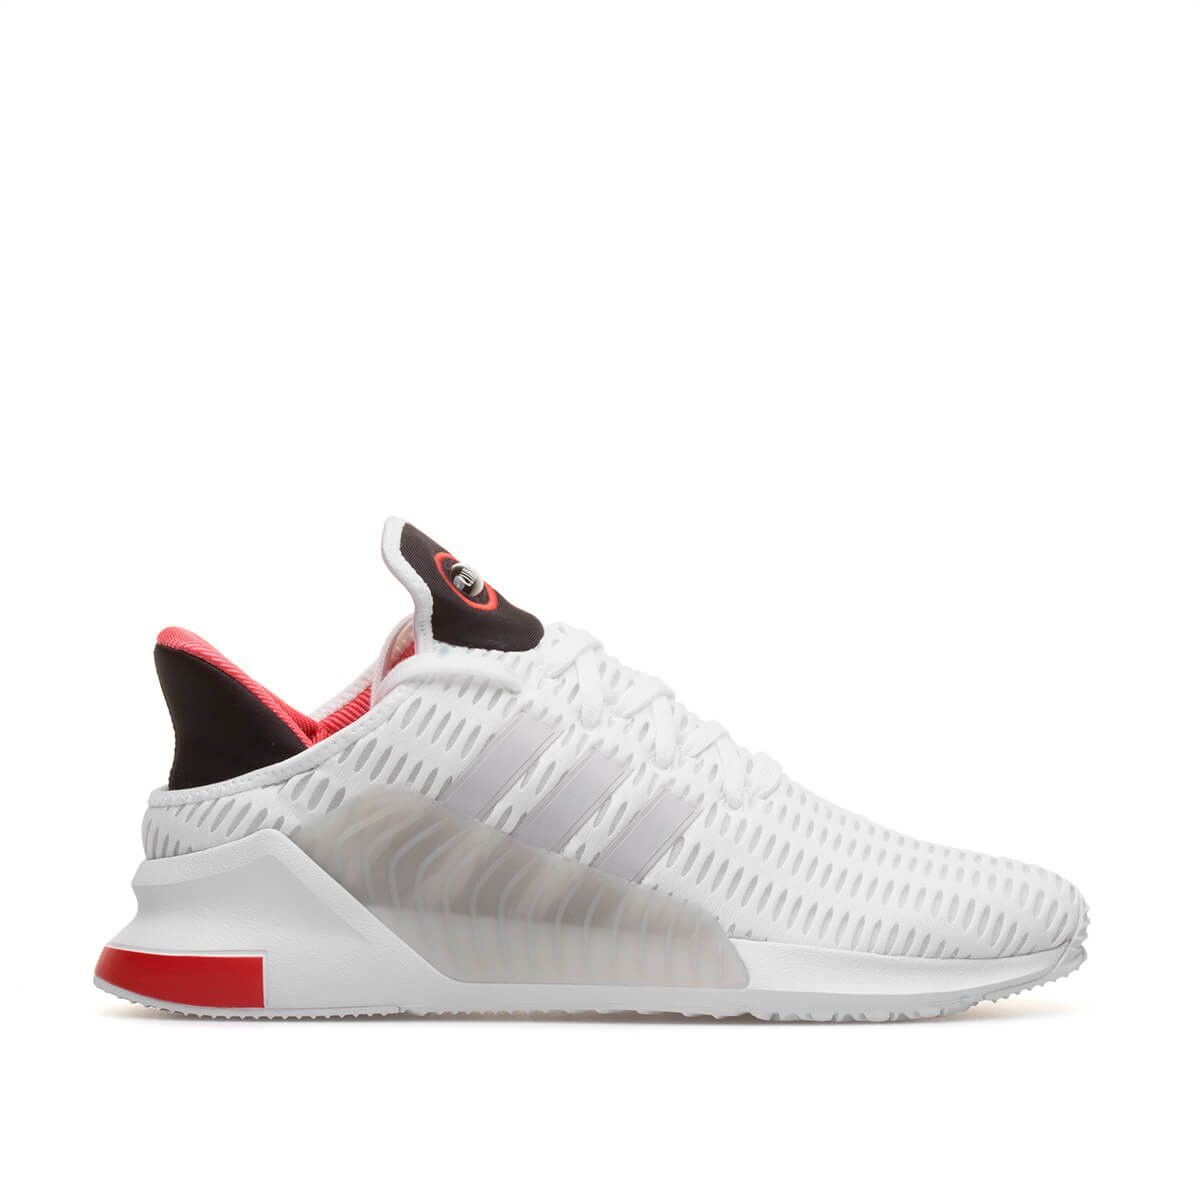 20f9ae6461c0 adidas-bucktown-street